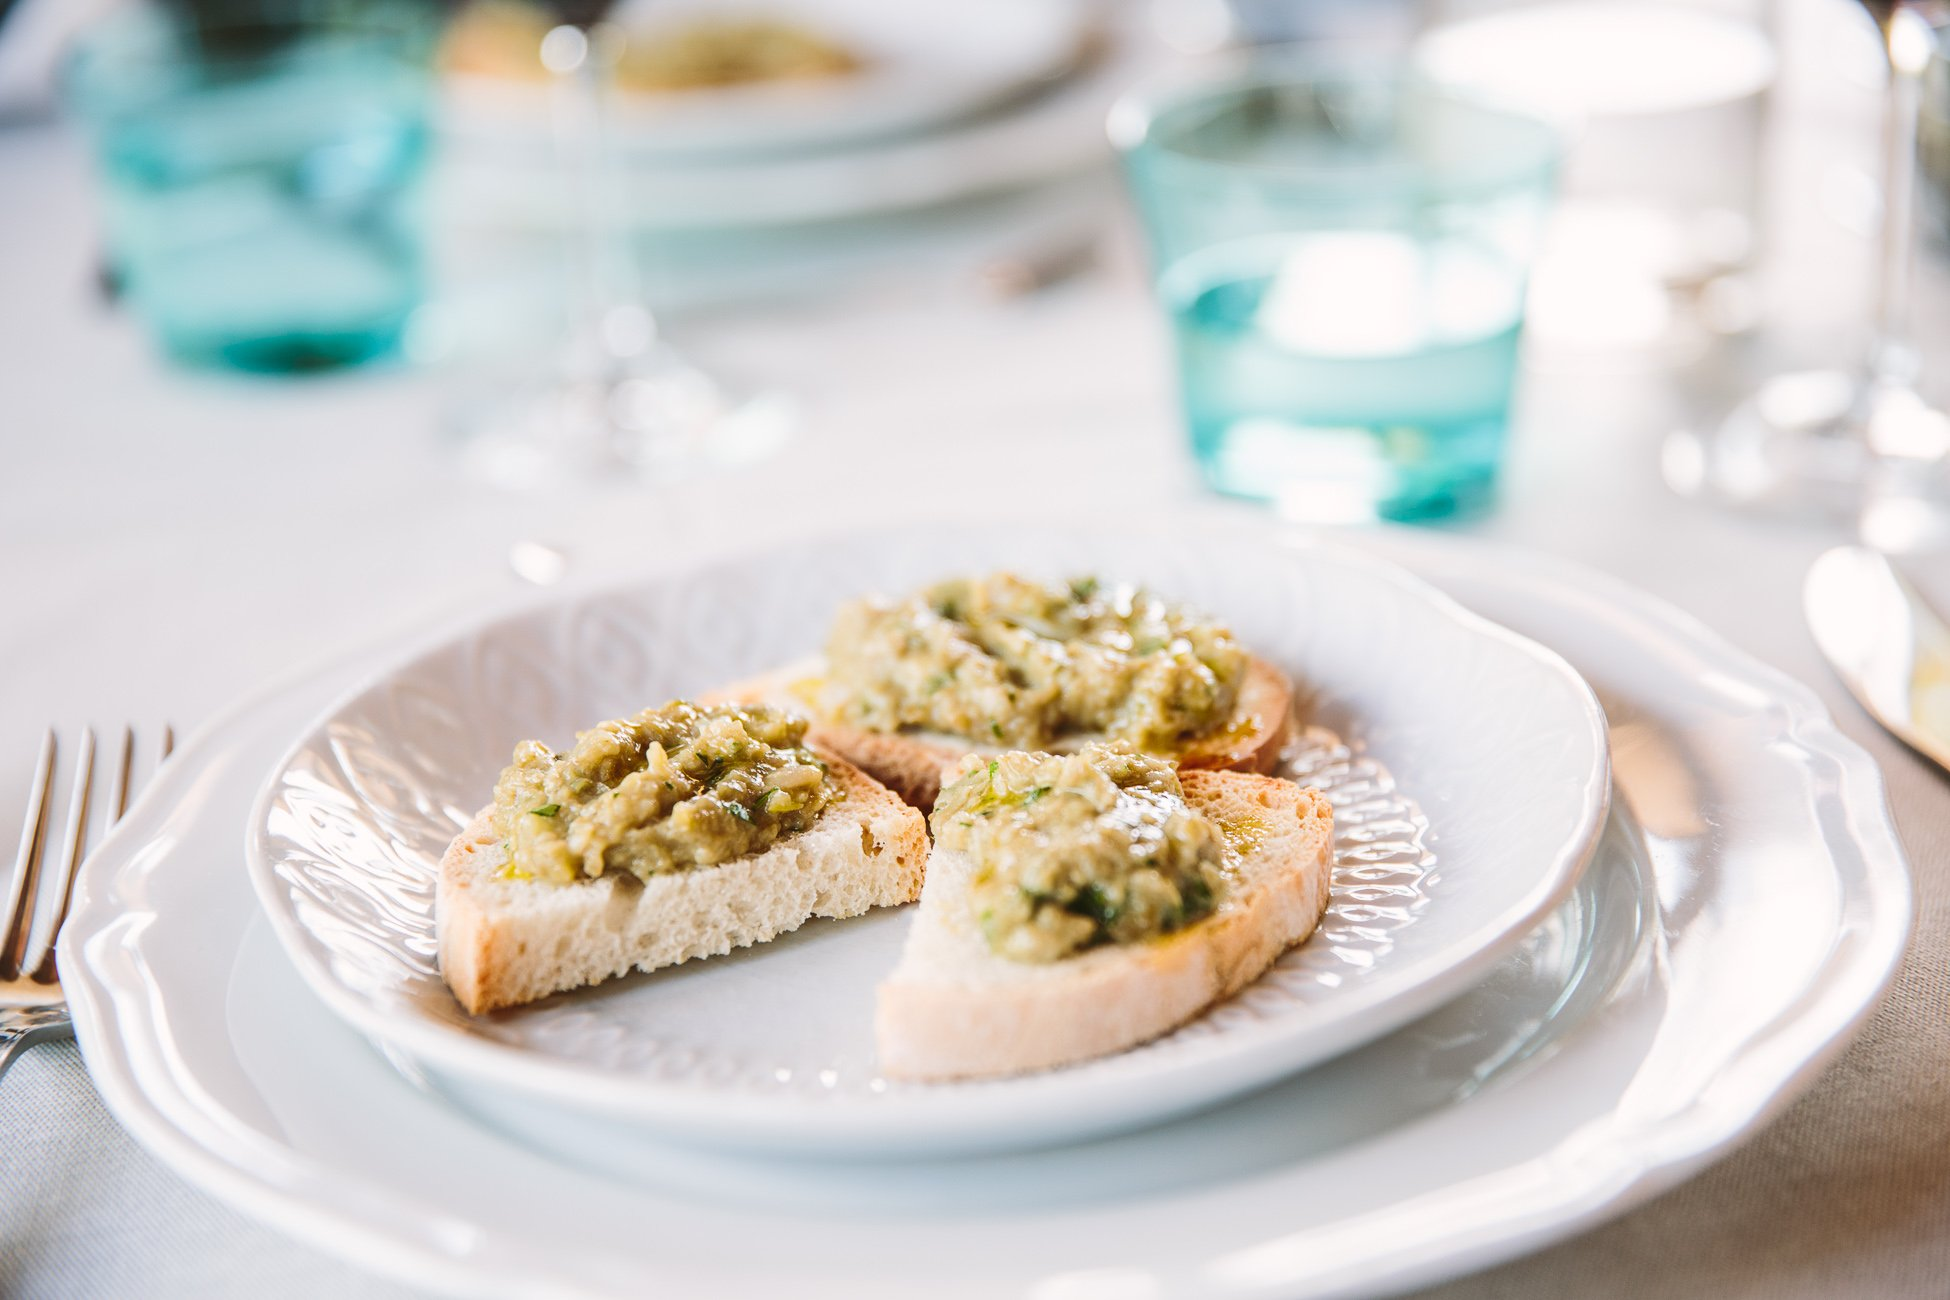 Tuscan food at Apparita Pomarance